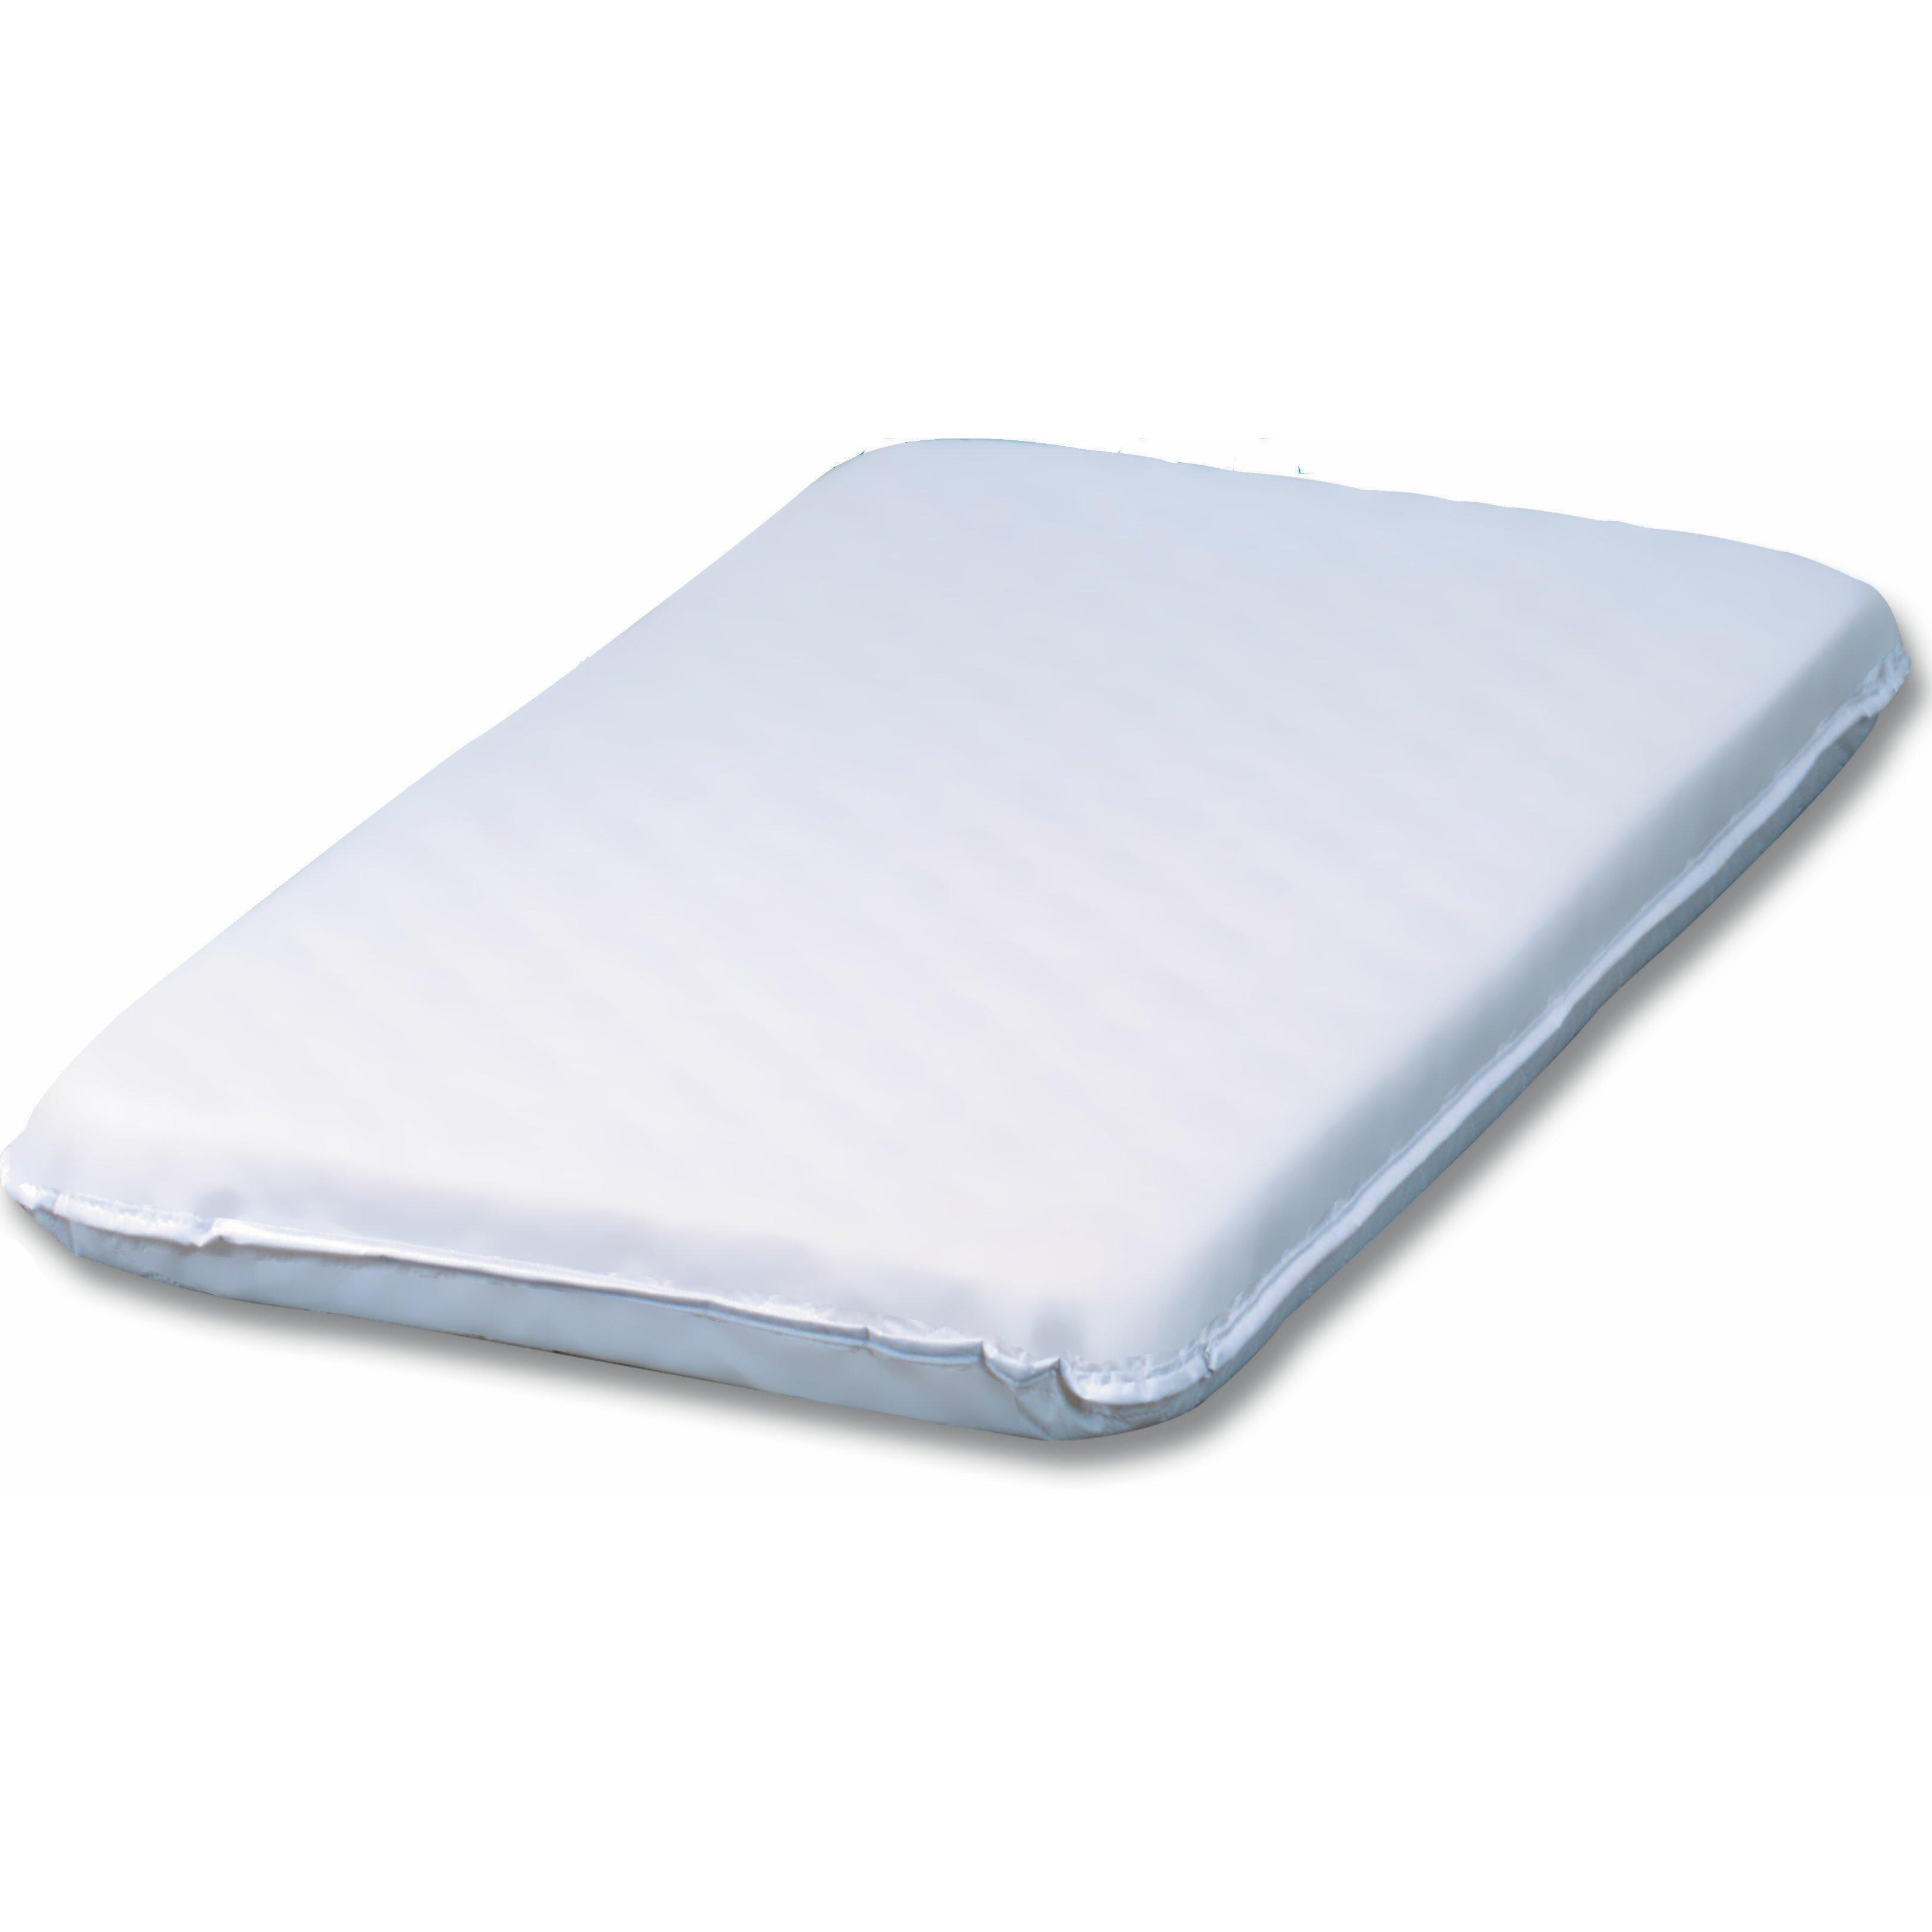 Baby doll crib mattress - Baby Doll Bedding Cradle 2 Quot Mattress